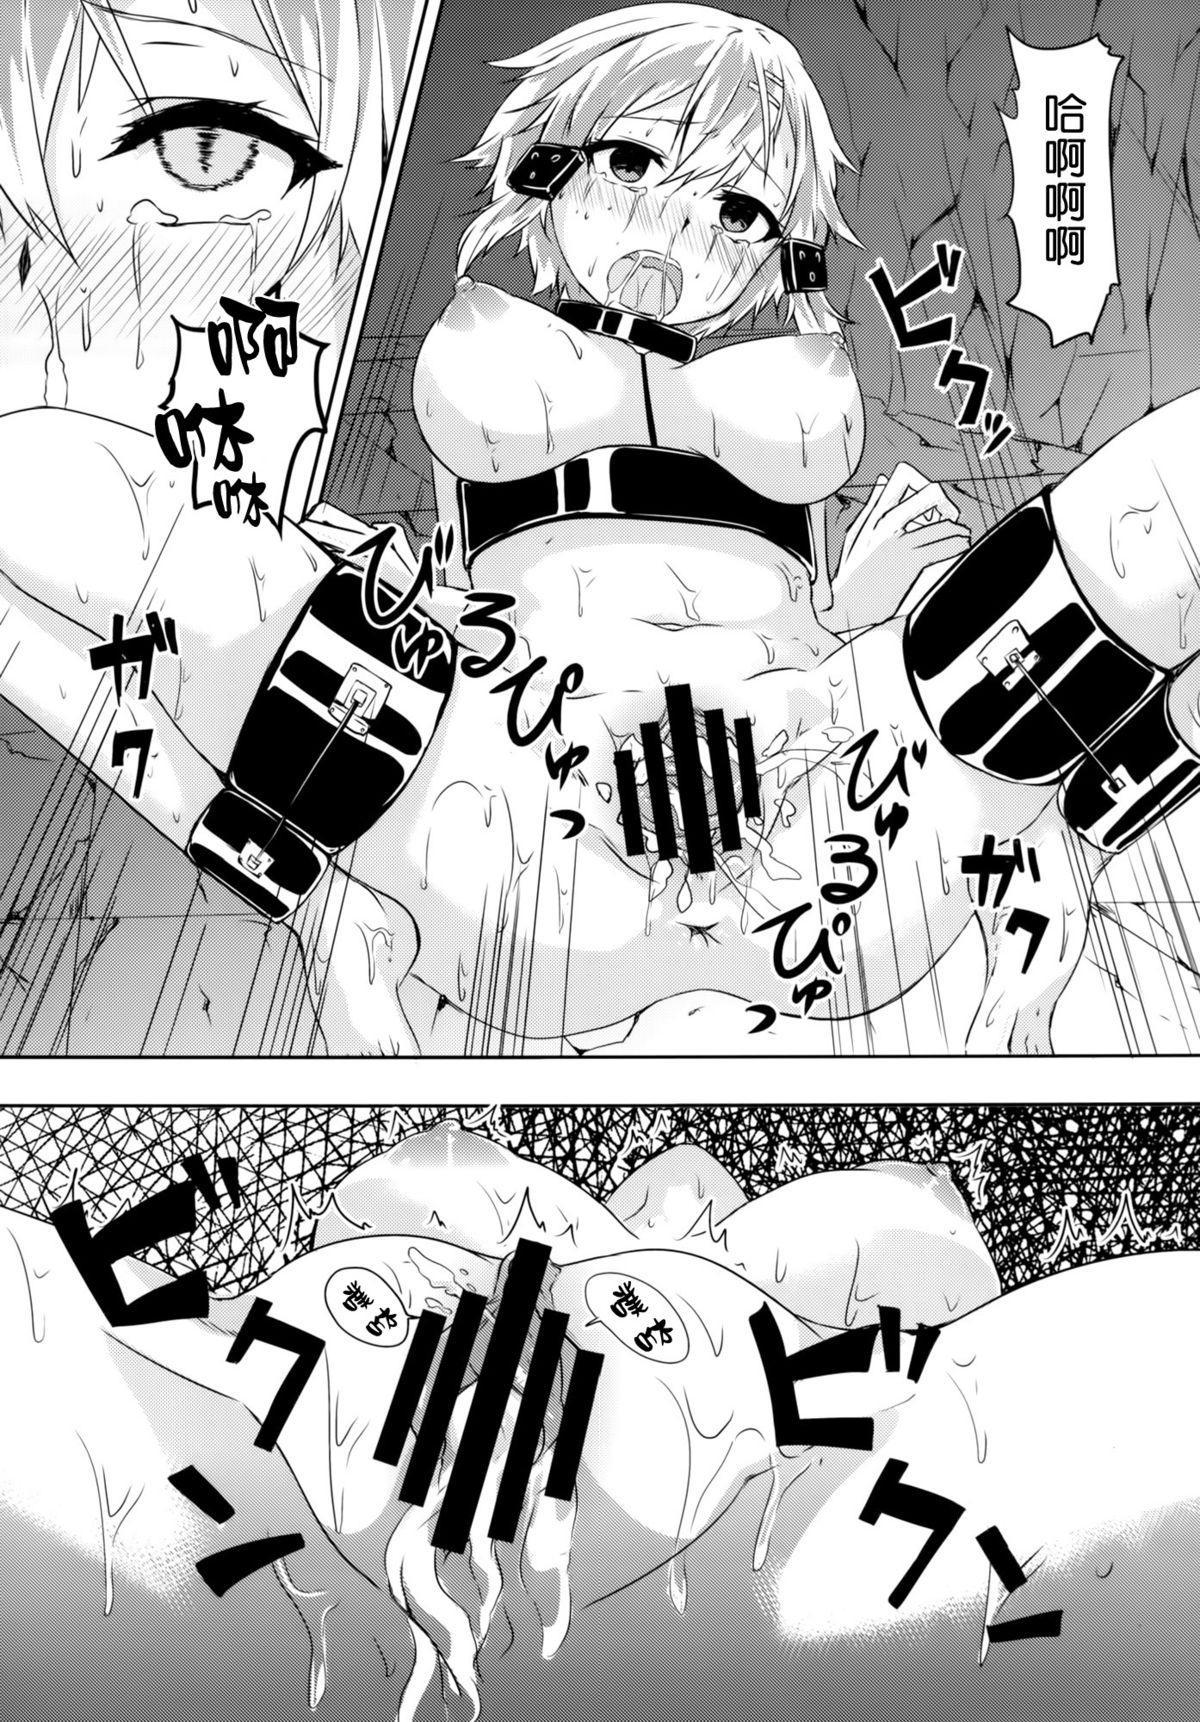 (C86) [Denpa Anshitsu (Jaku Denpa)] Asada-san ASADA-SAN (Sword Art Online) [Chinese] [空気系☆漢化] 11